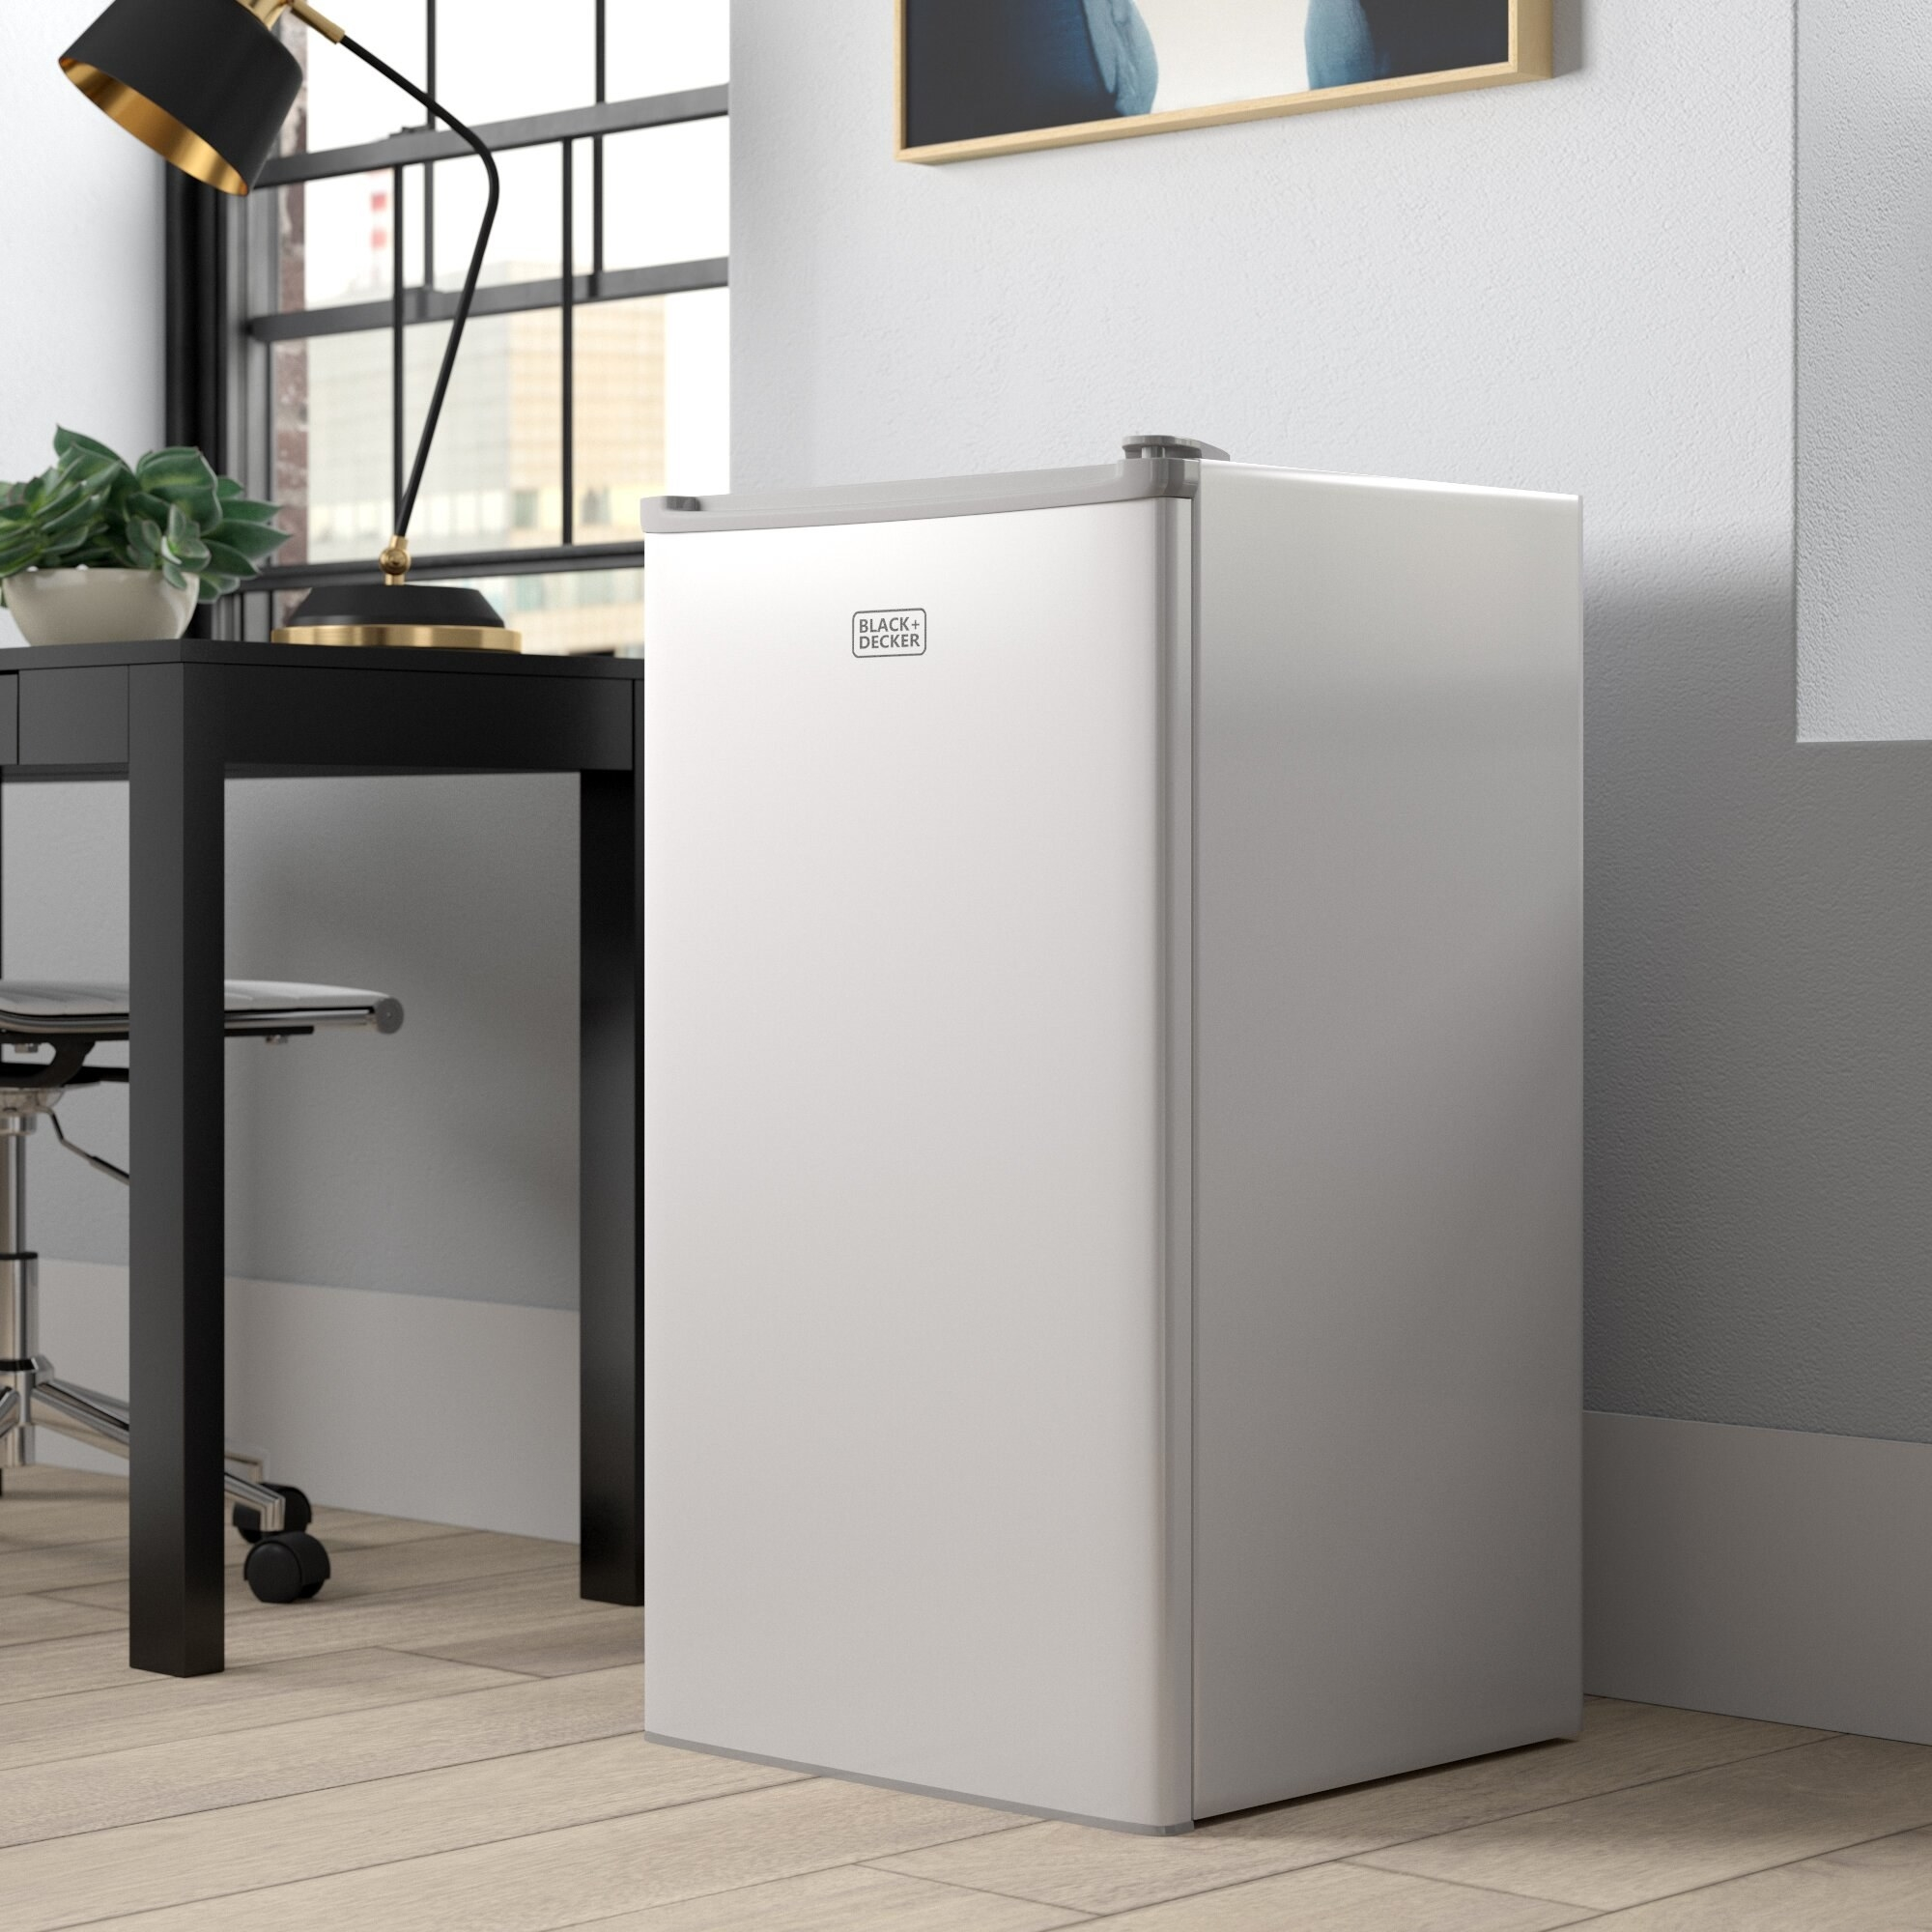 A white mini fridge propped next to a desk